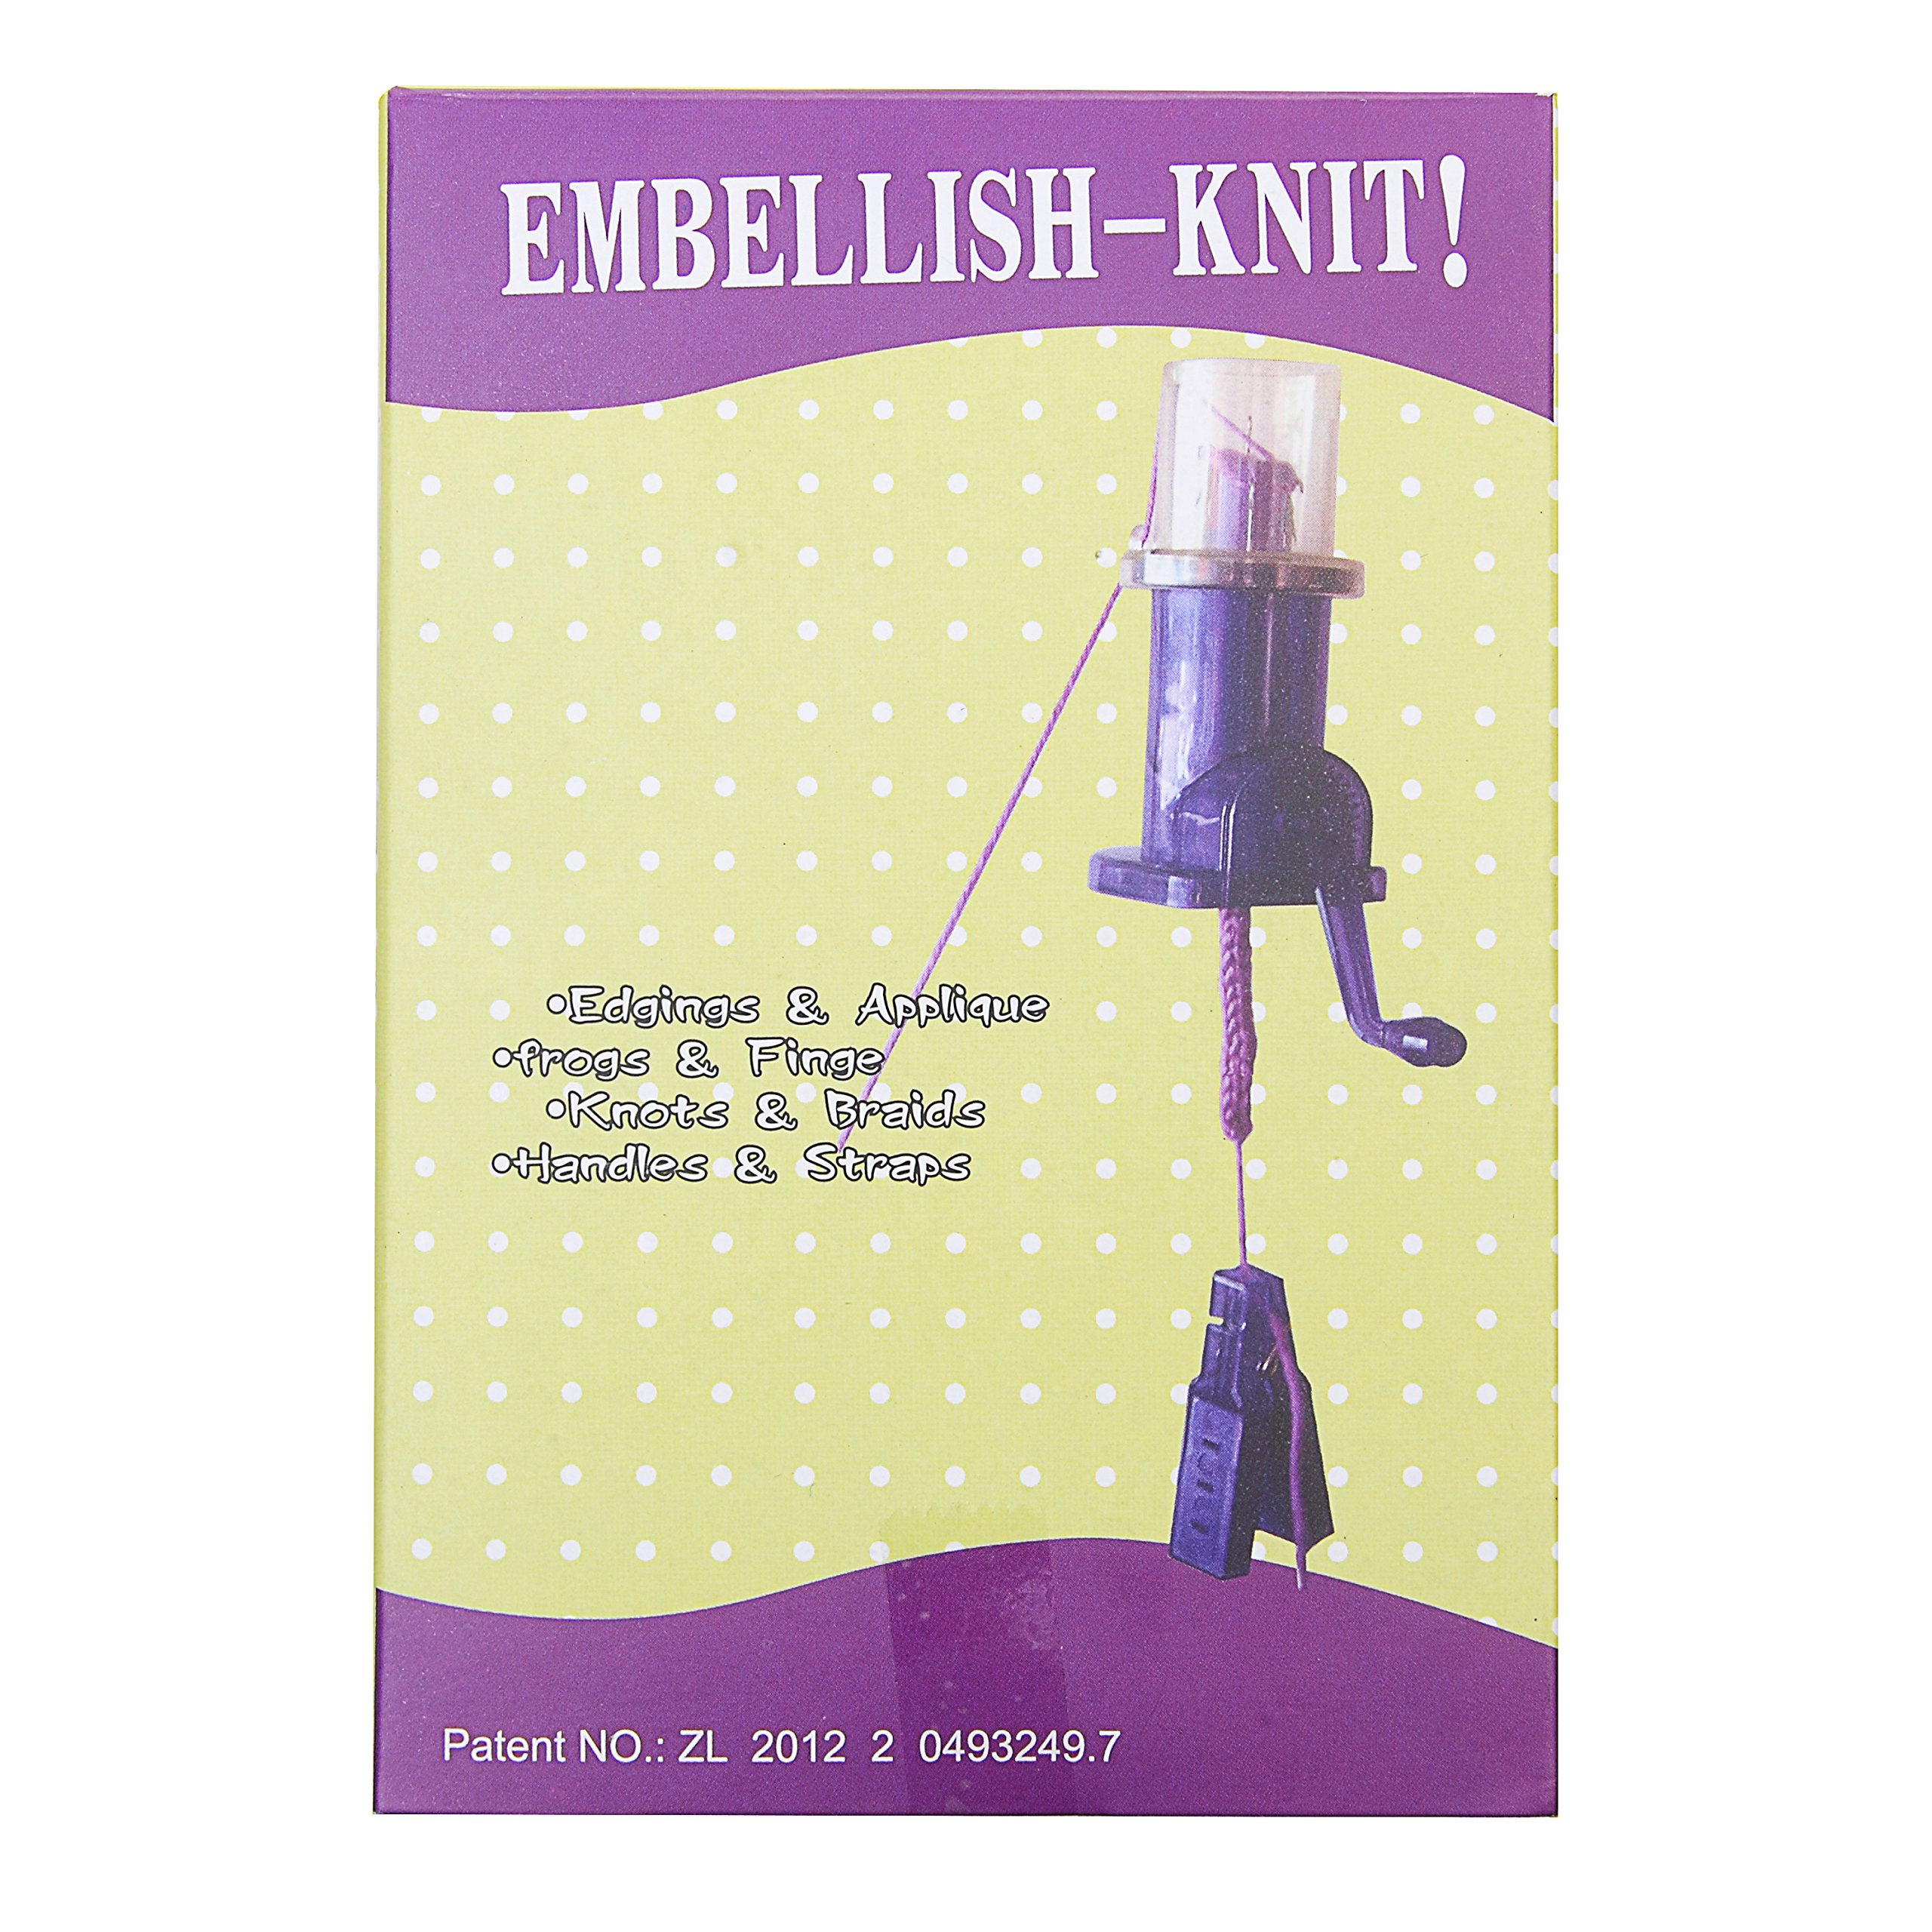 Aeakey Weaver Knitting Tool Hand Crank Weaver Domestic Hand-cranked (Winding Machine/Winder/Yarn/Lace) Knitting Tools Manual Tools Useful DIY Tools (Blue)